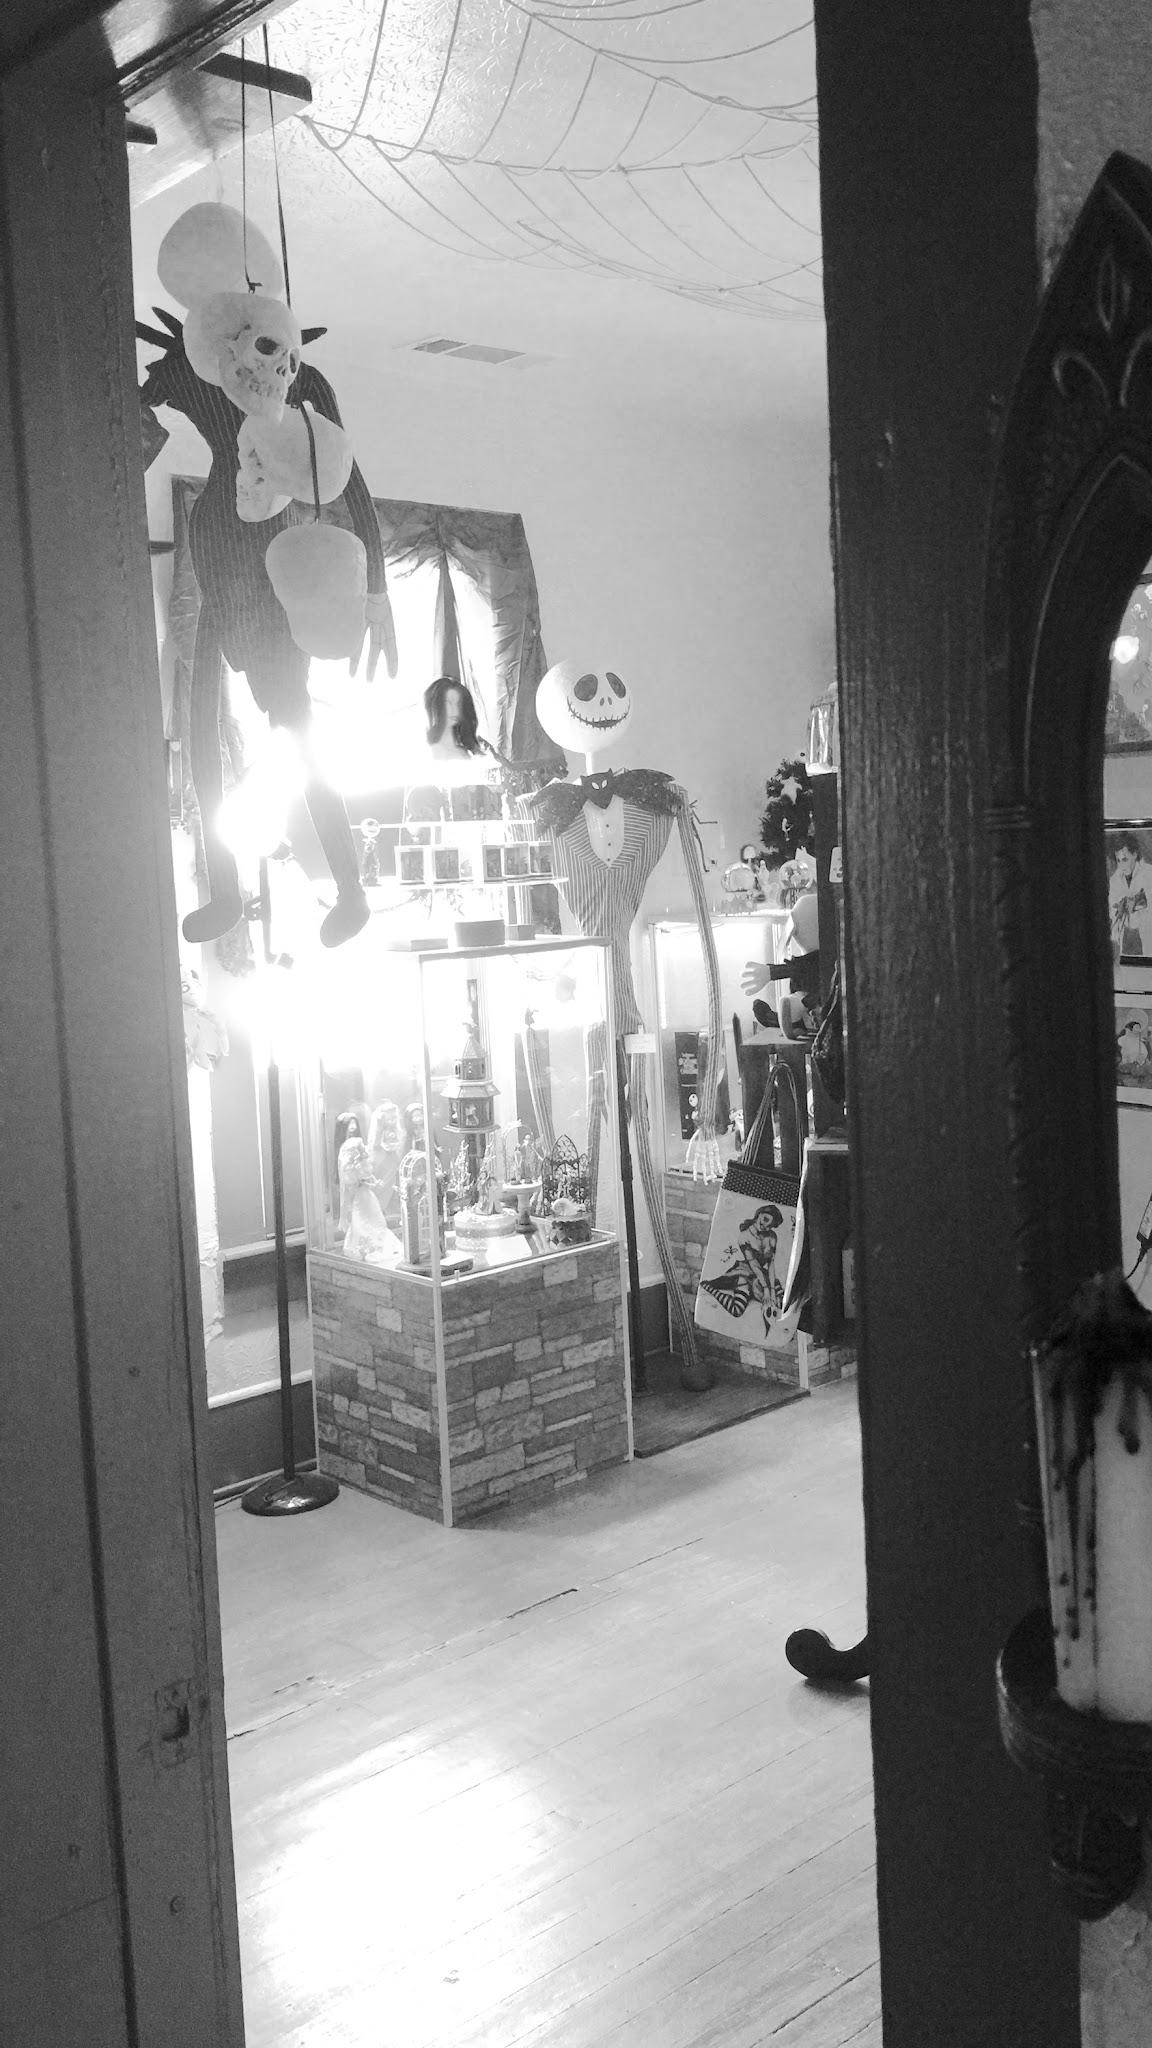 Peeking into the Tim Burton room